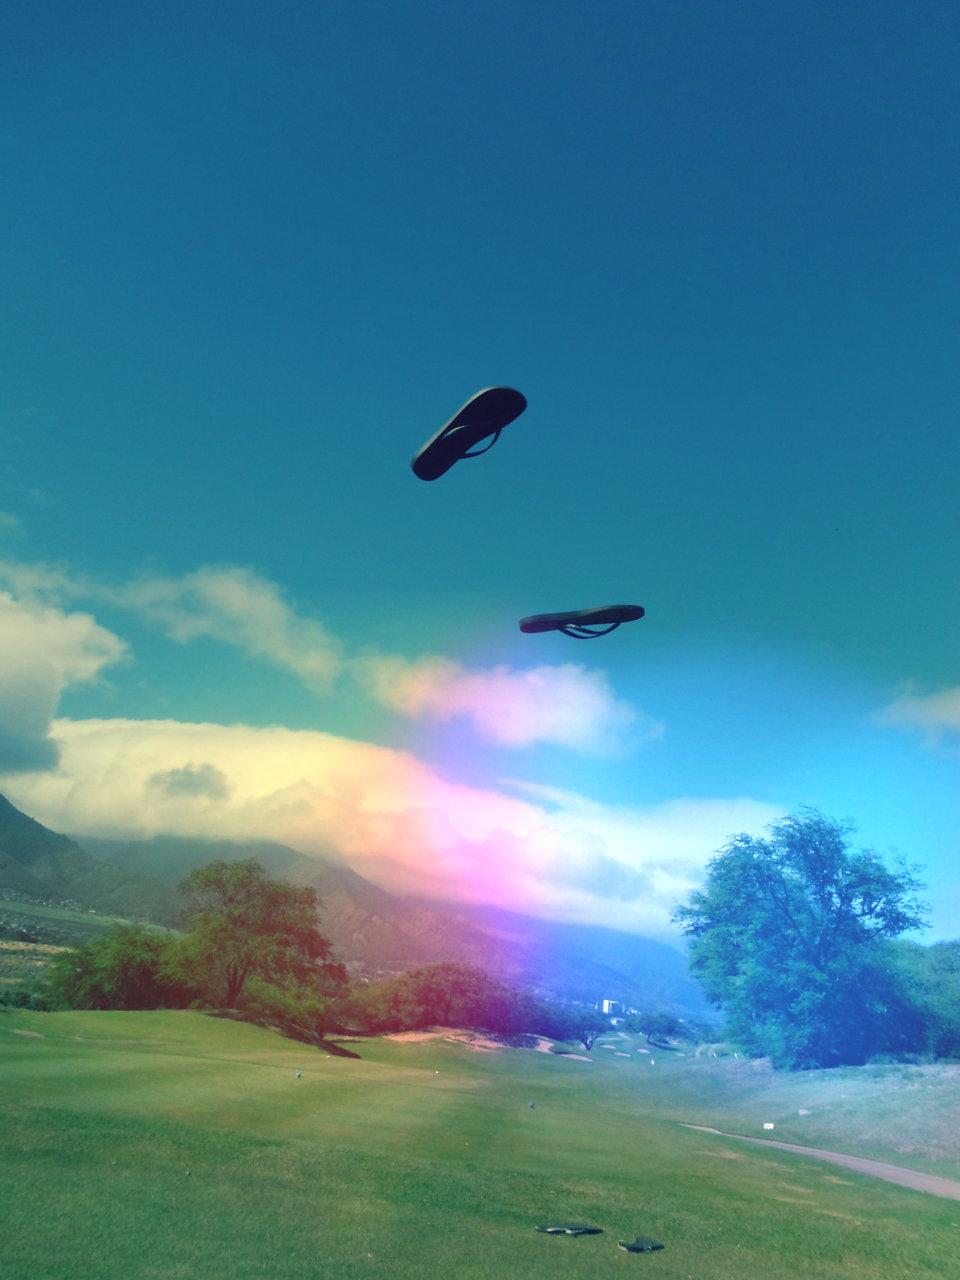 Flying slippers. #adventure #romance #maui